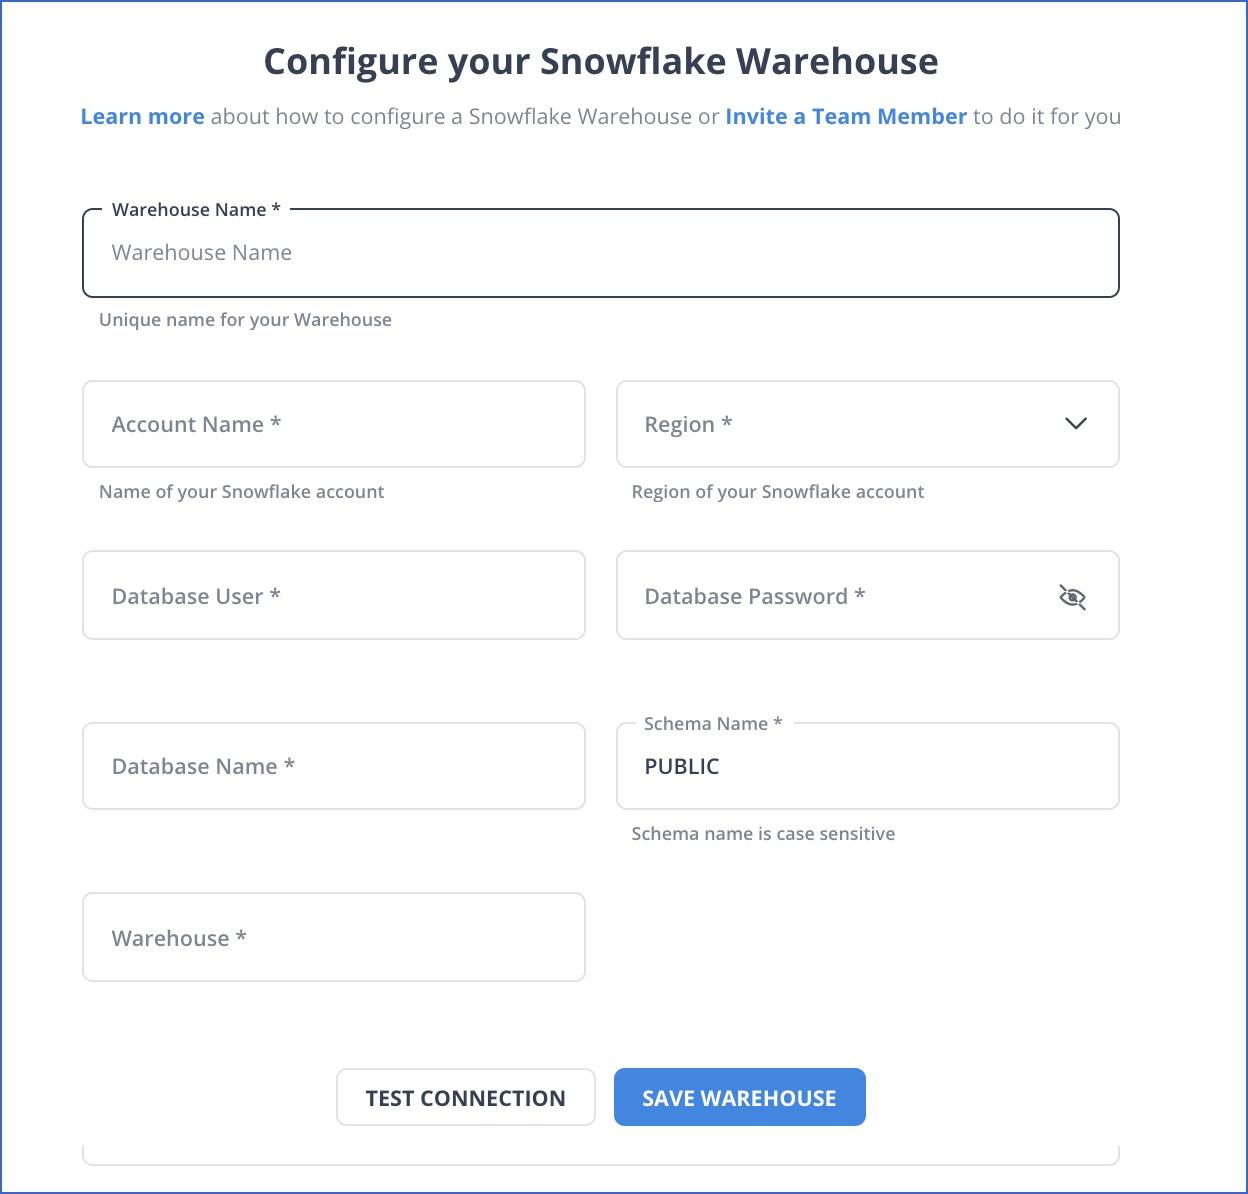 Snowflake Warehouse Settings